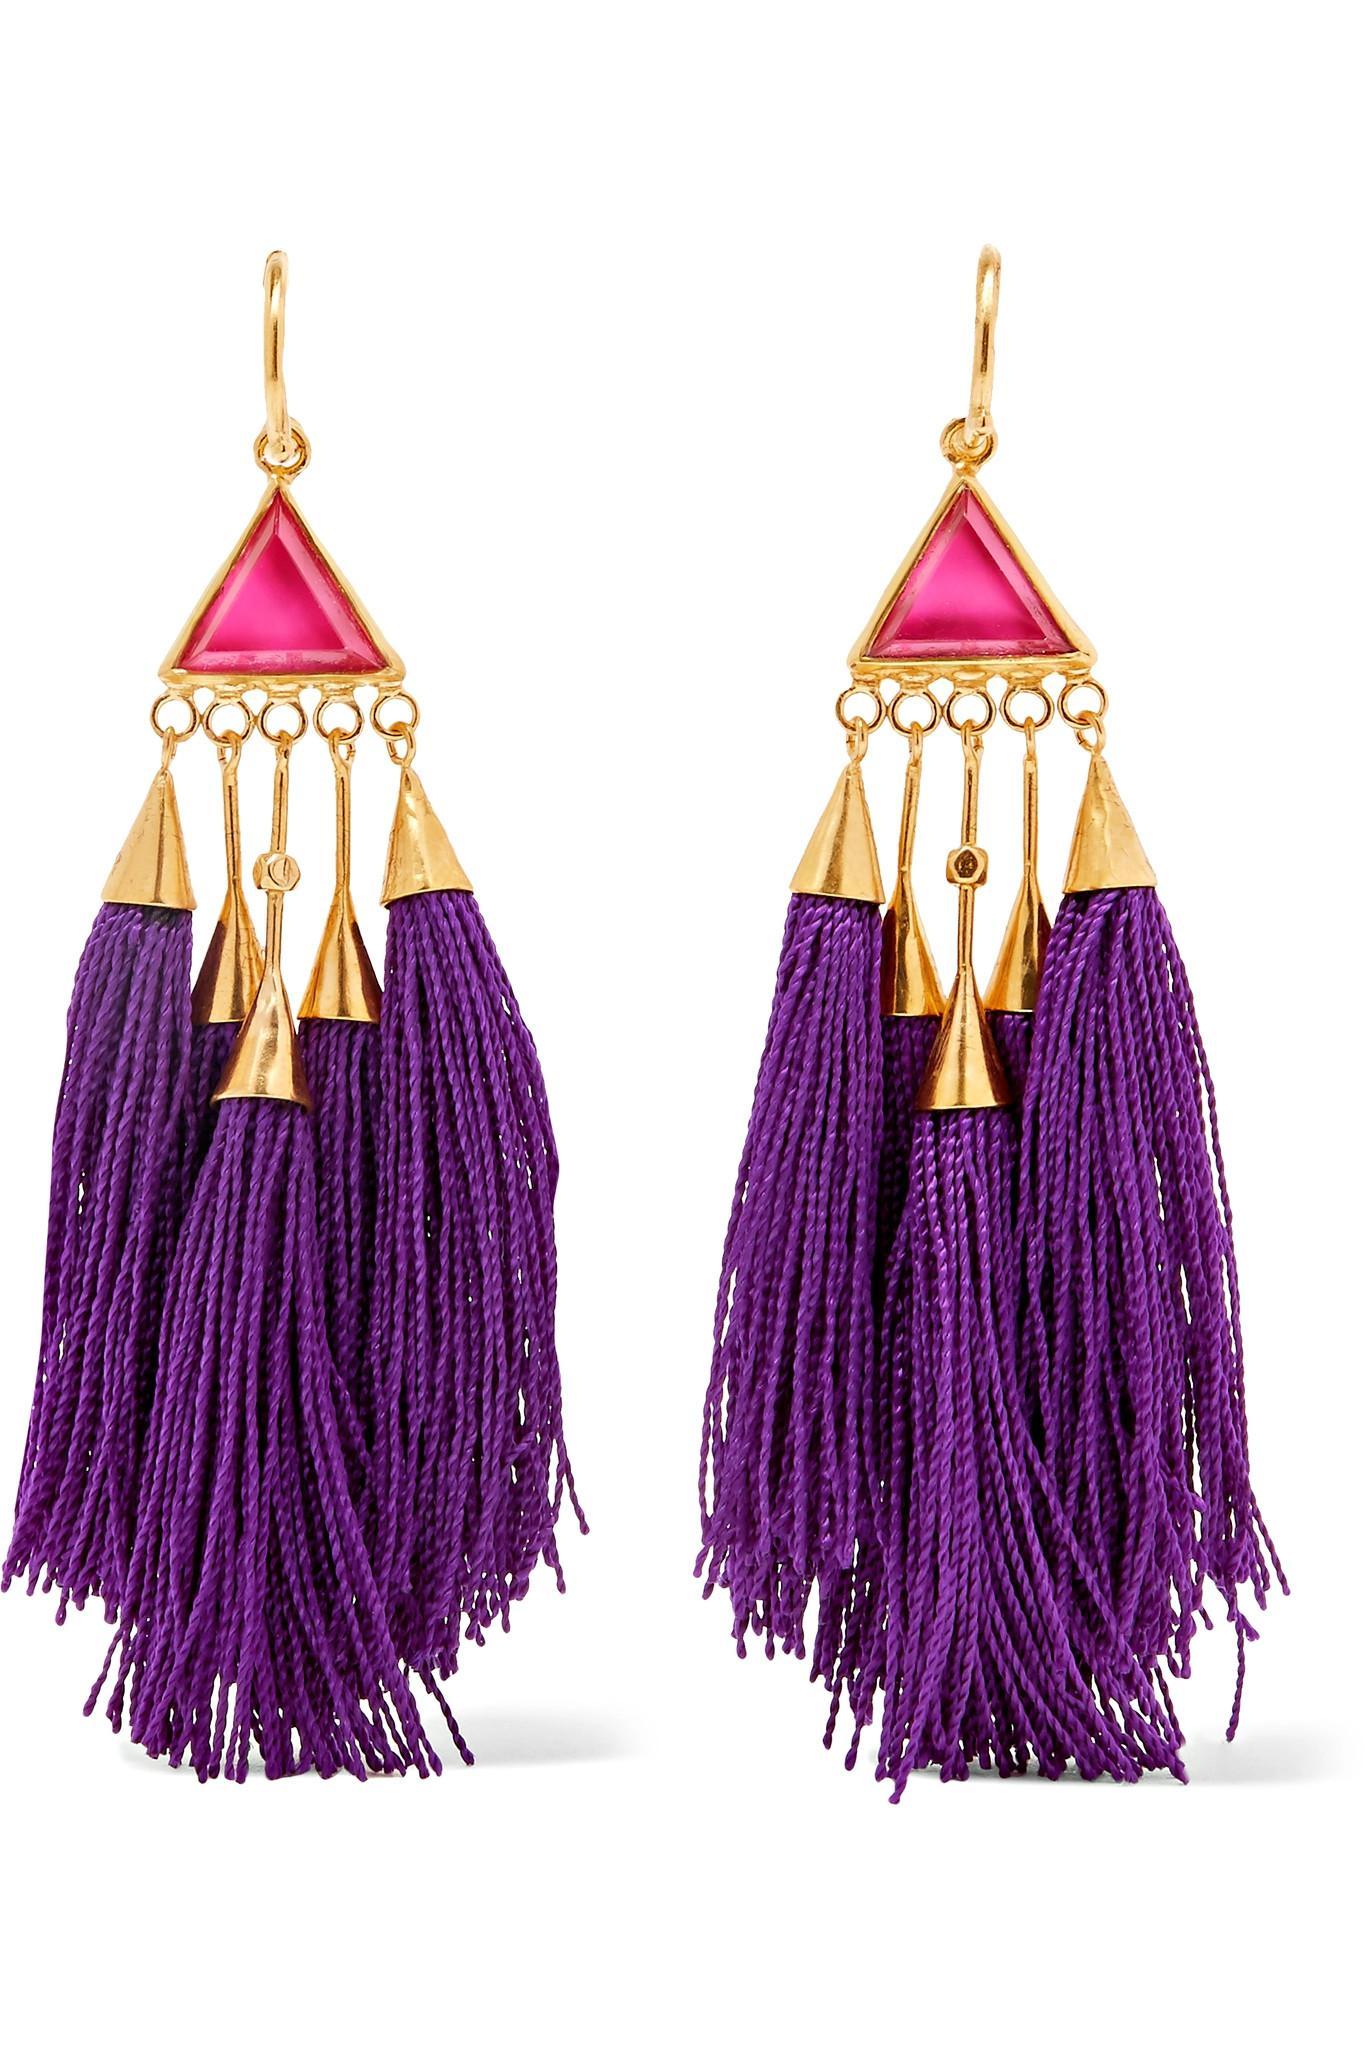 Tasseled Gold-tone Crystal Earrings - Purple Katerina Makriyianni YF55Nwp